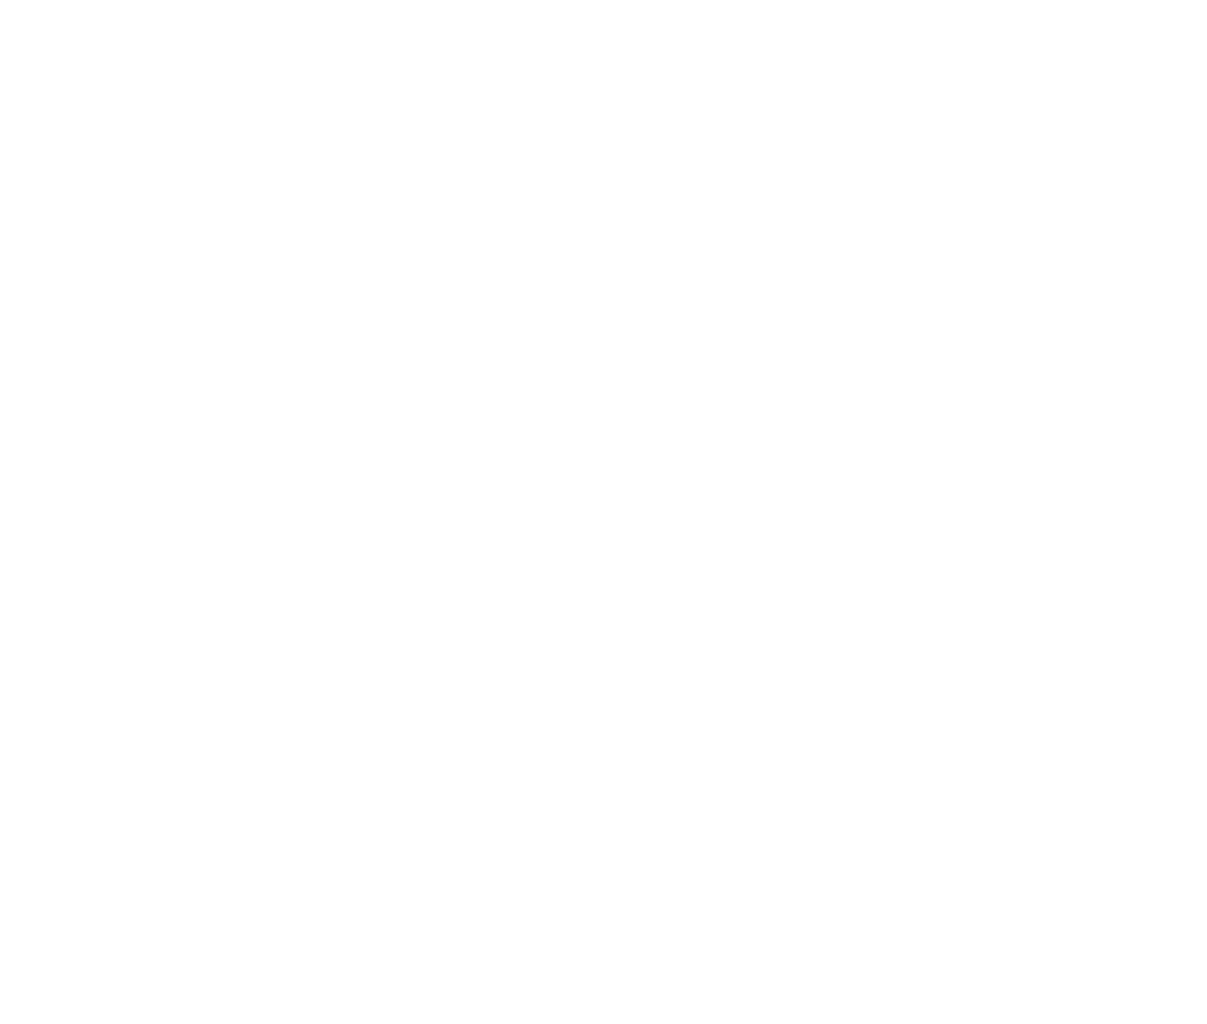 un-logo-white